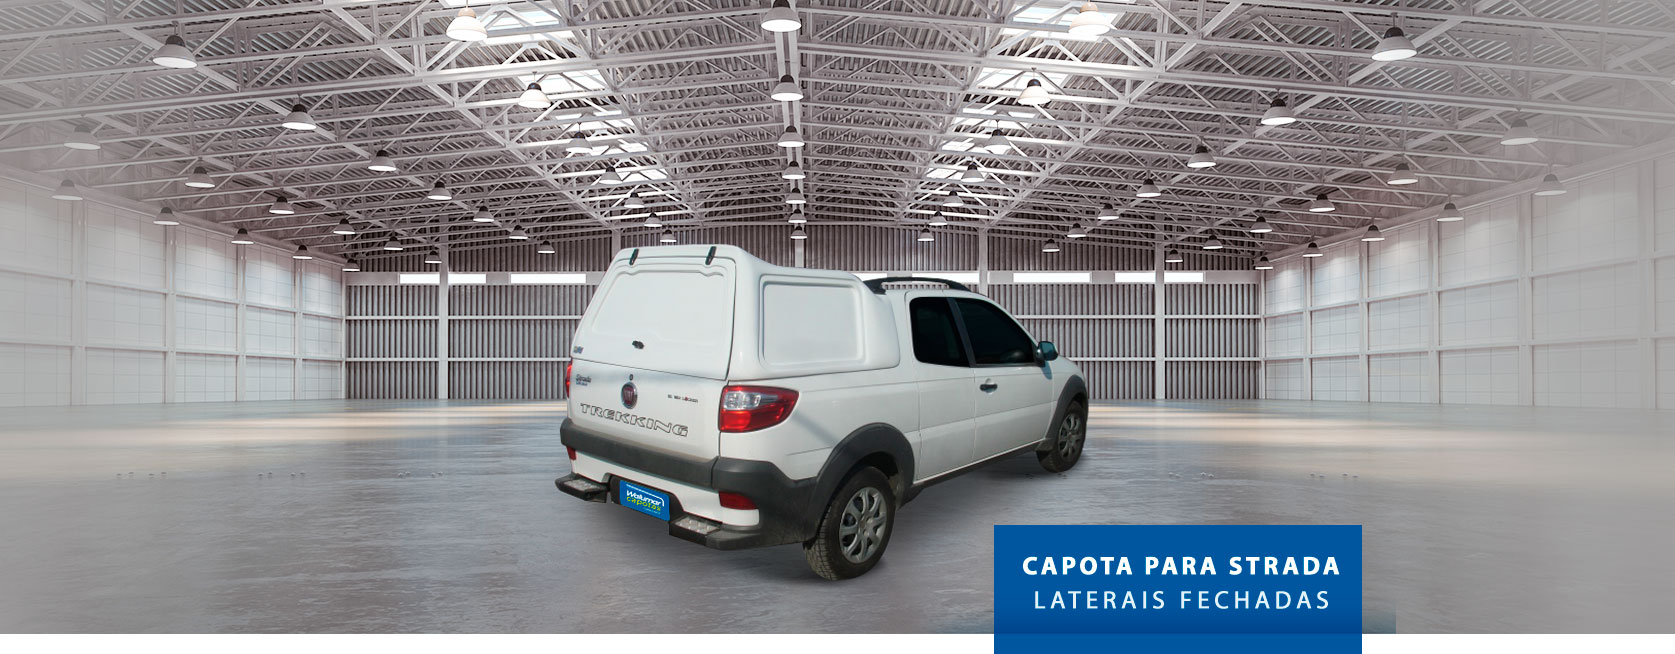 Lateral Fechada - Capota de Fibra Fiat Strada